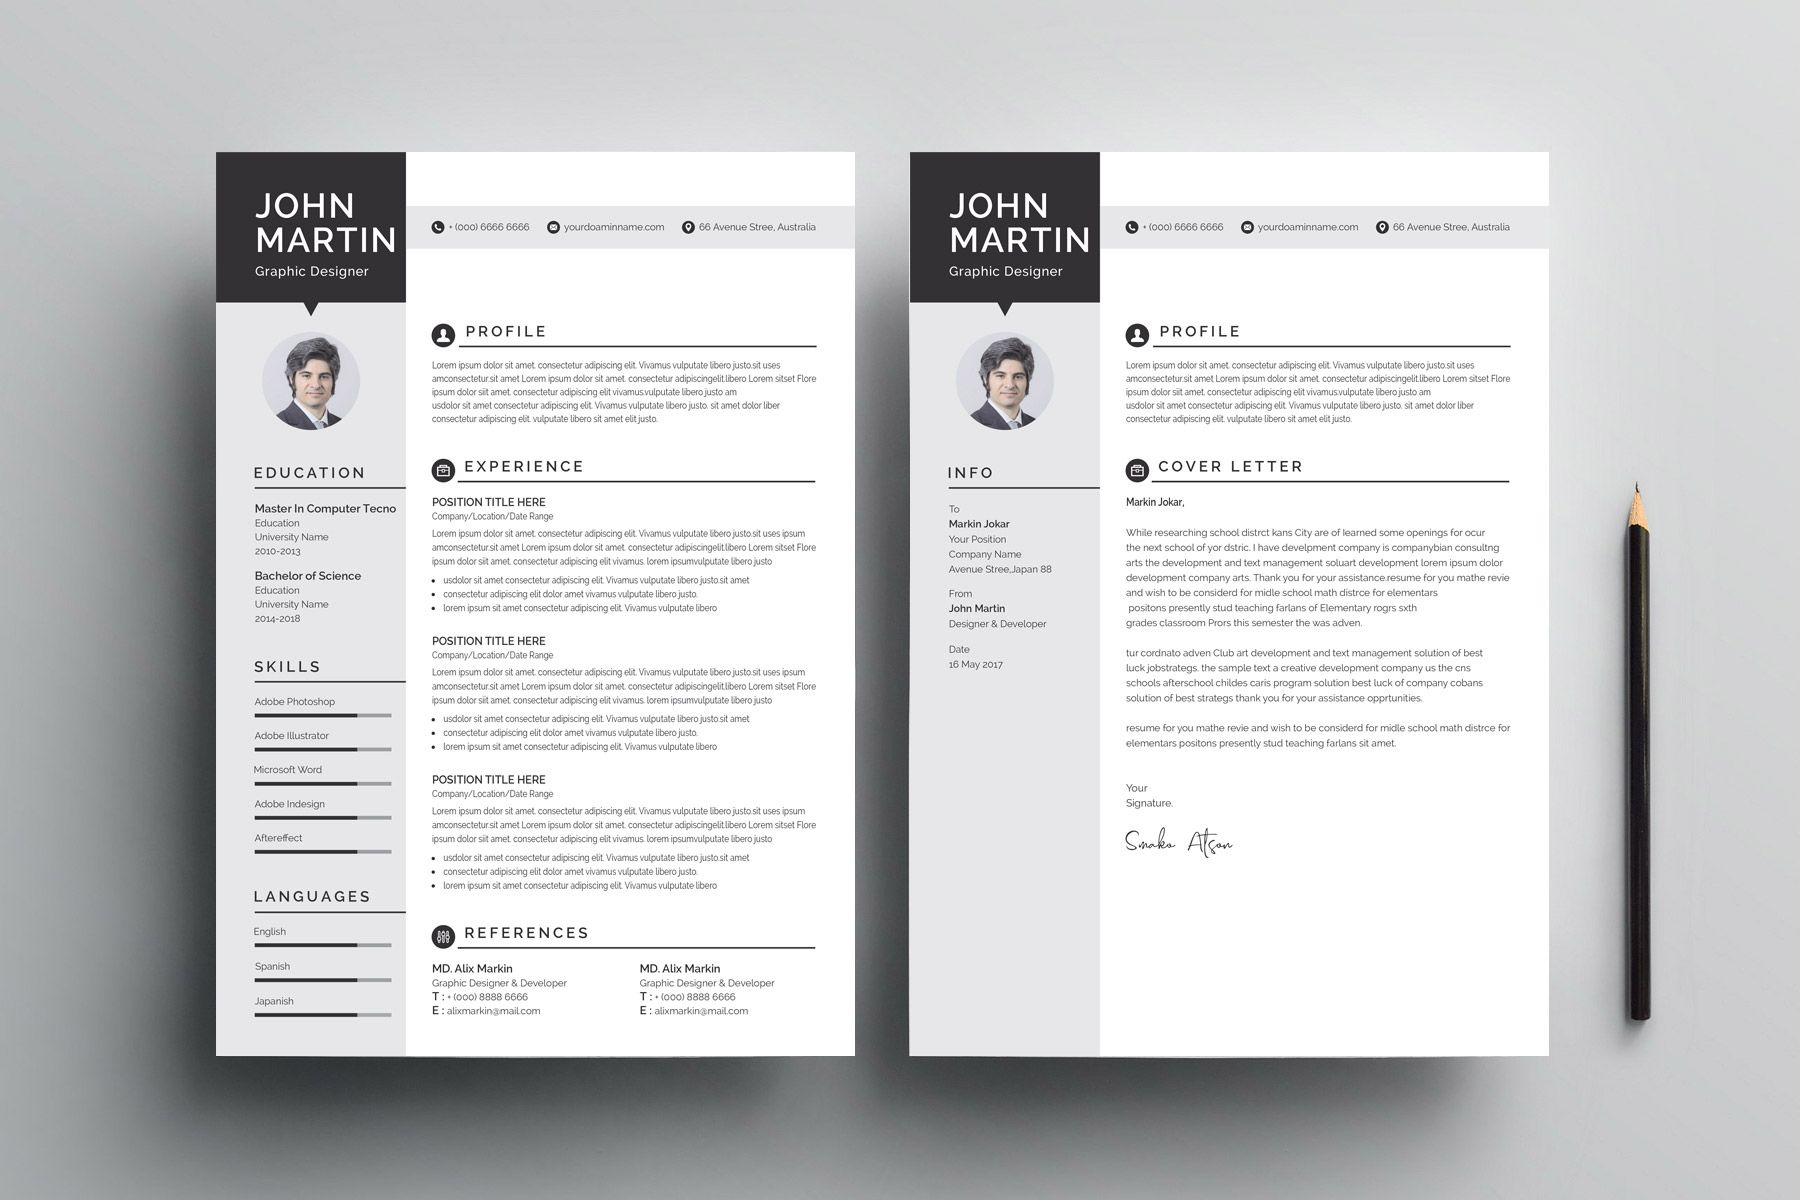 Minimalist Cv Design Templates Cv Design Template Resume Design